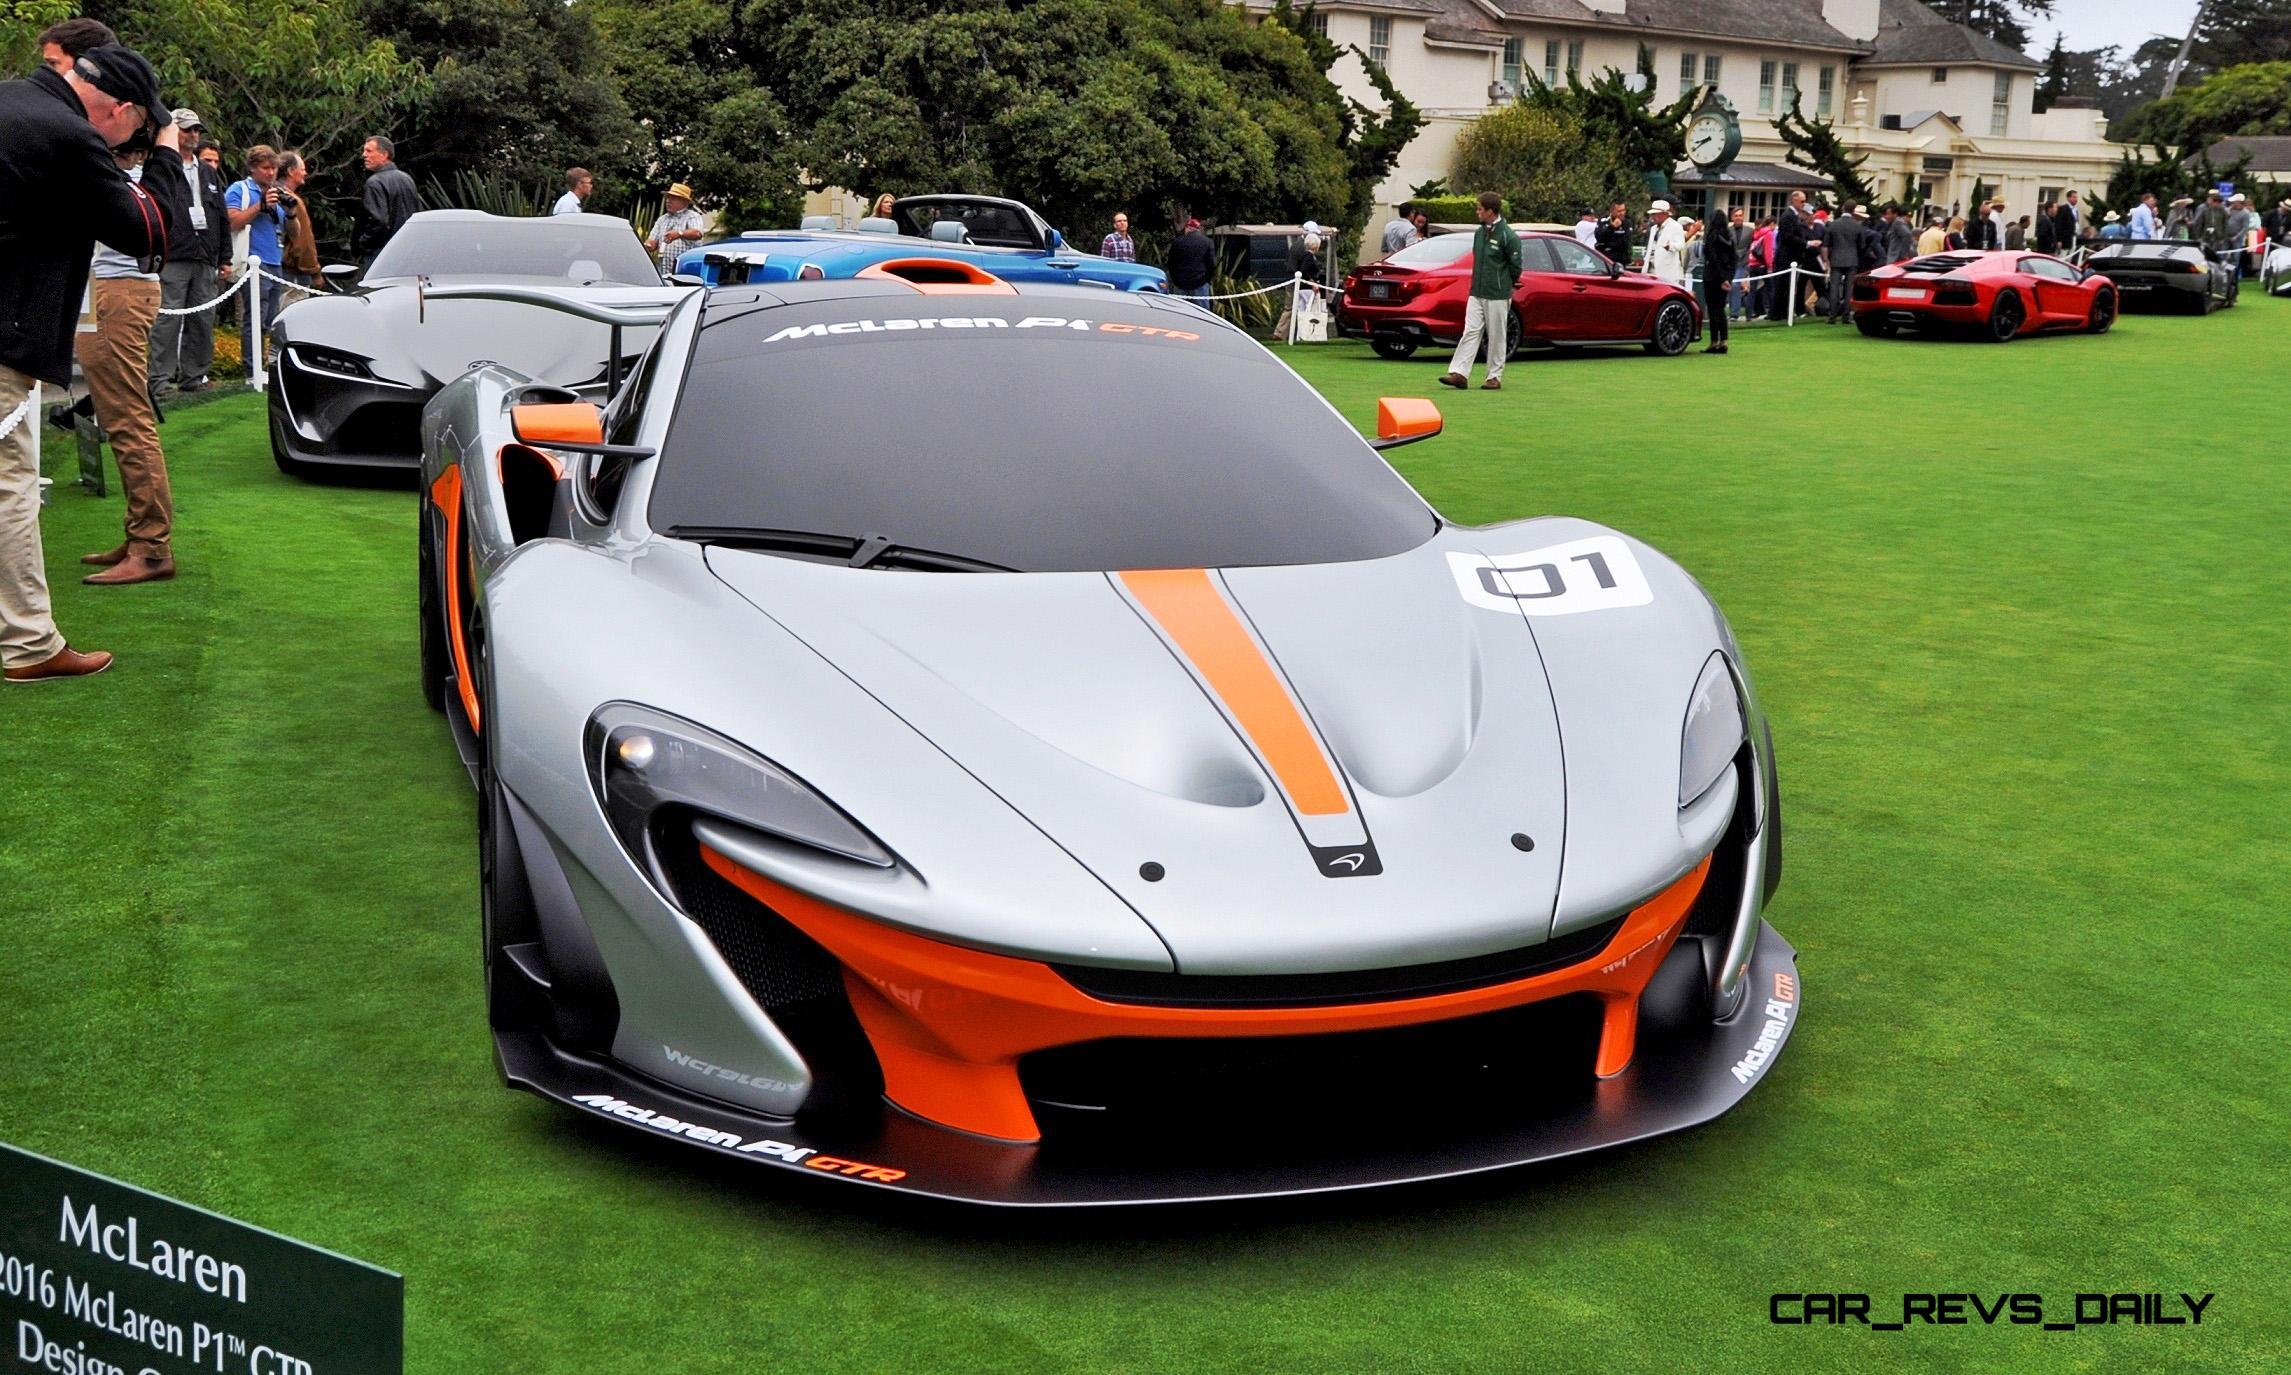 2016 McLaren P1 GTR - Pebble Beach World Debut 2